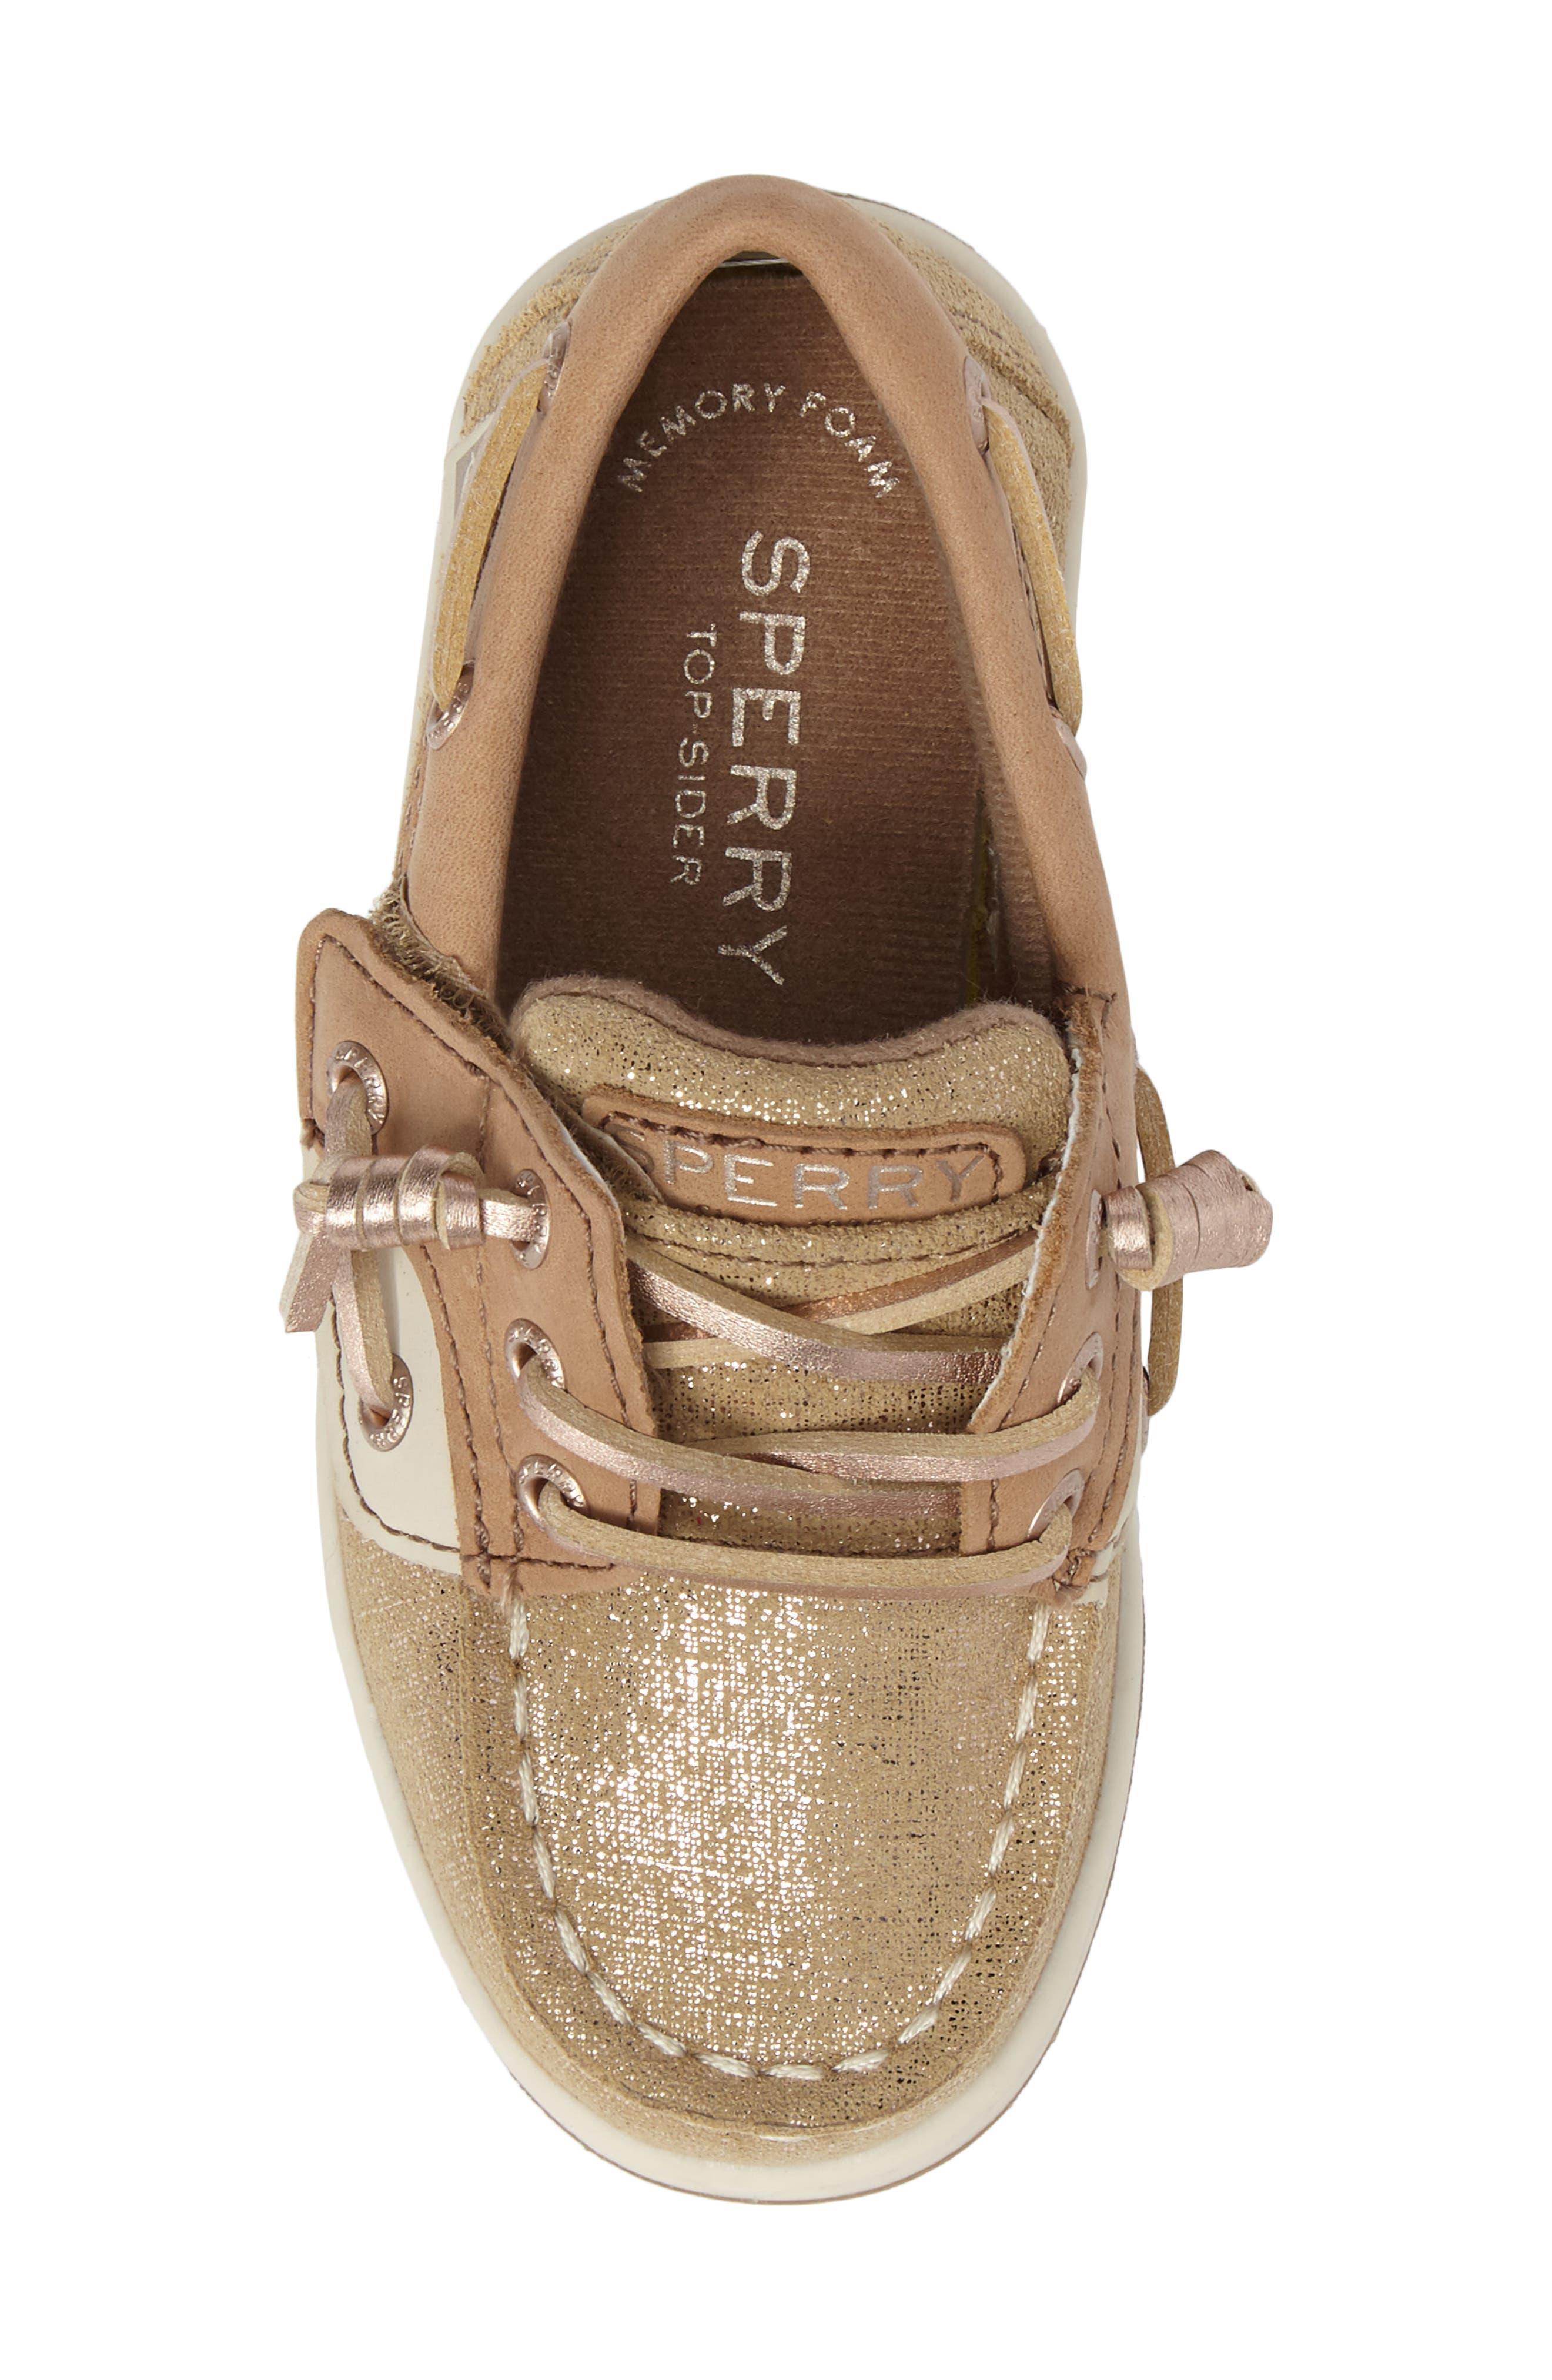 'Songfish Jr' Boat Shoe,                             Alternate thumbnail 5, color,                             Linen/ Gold